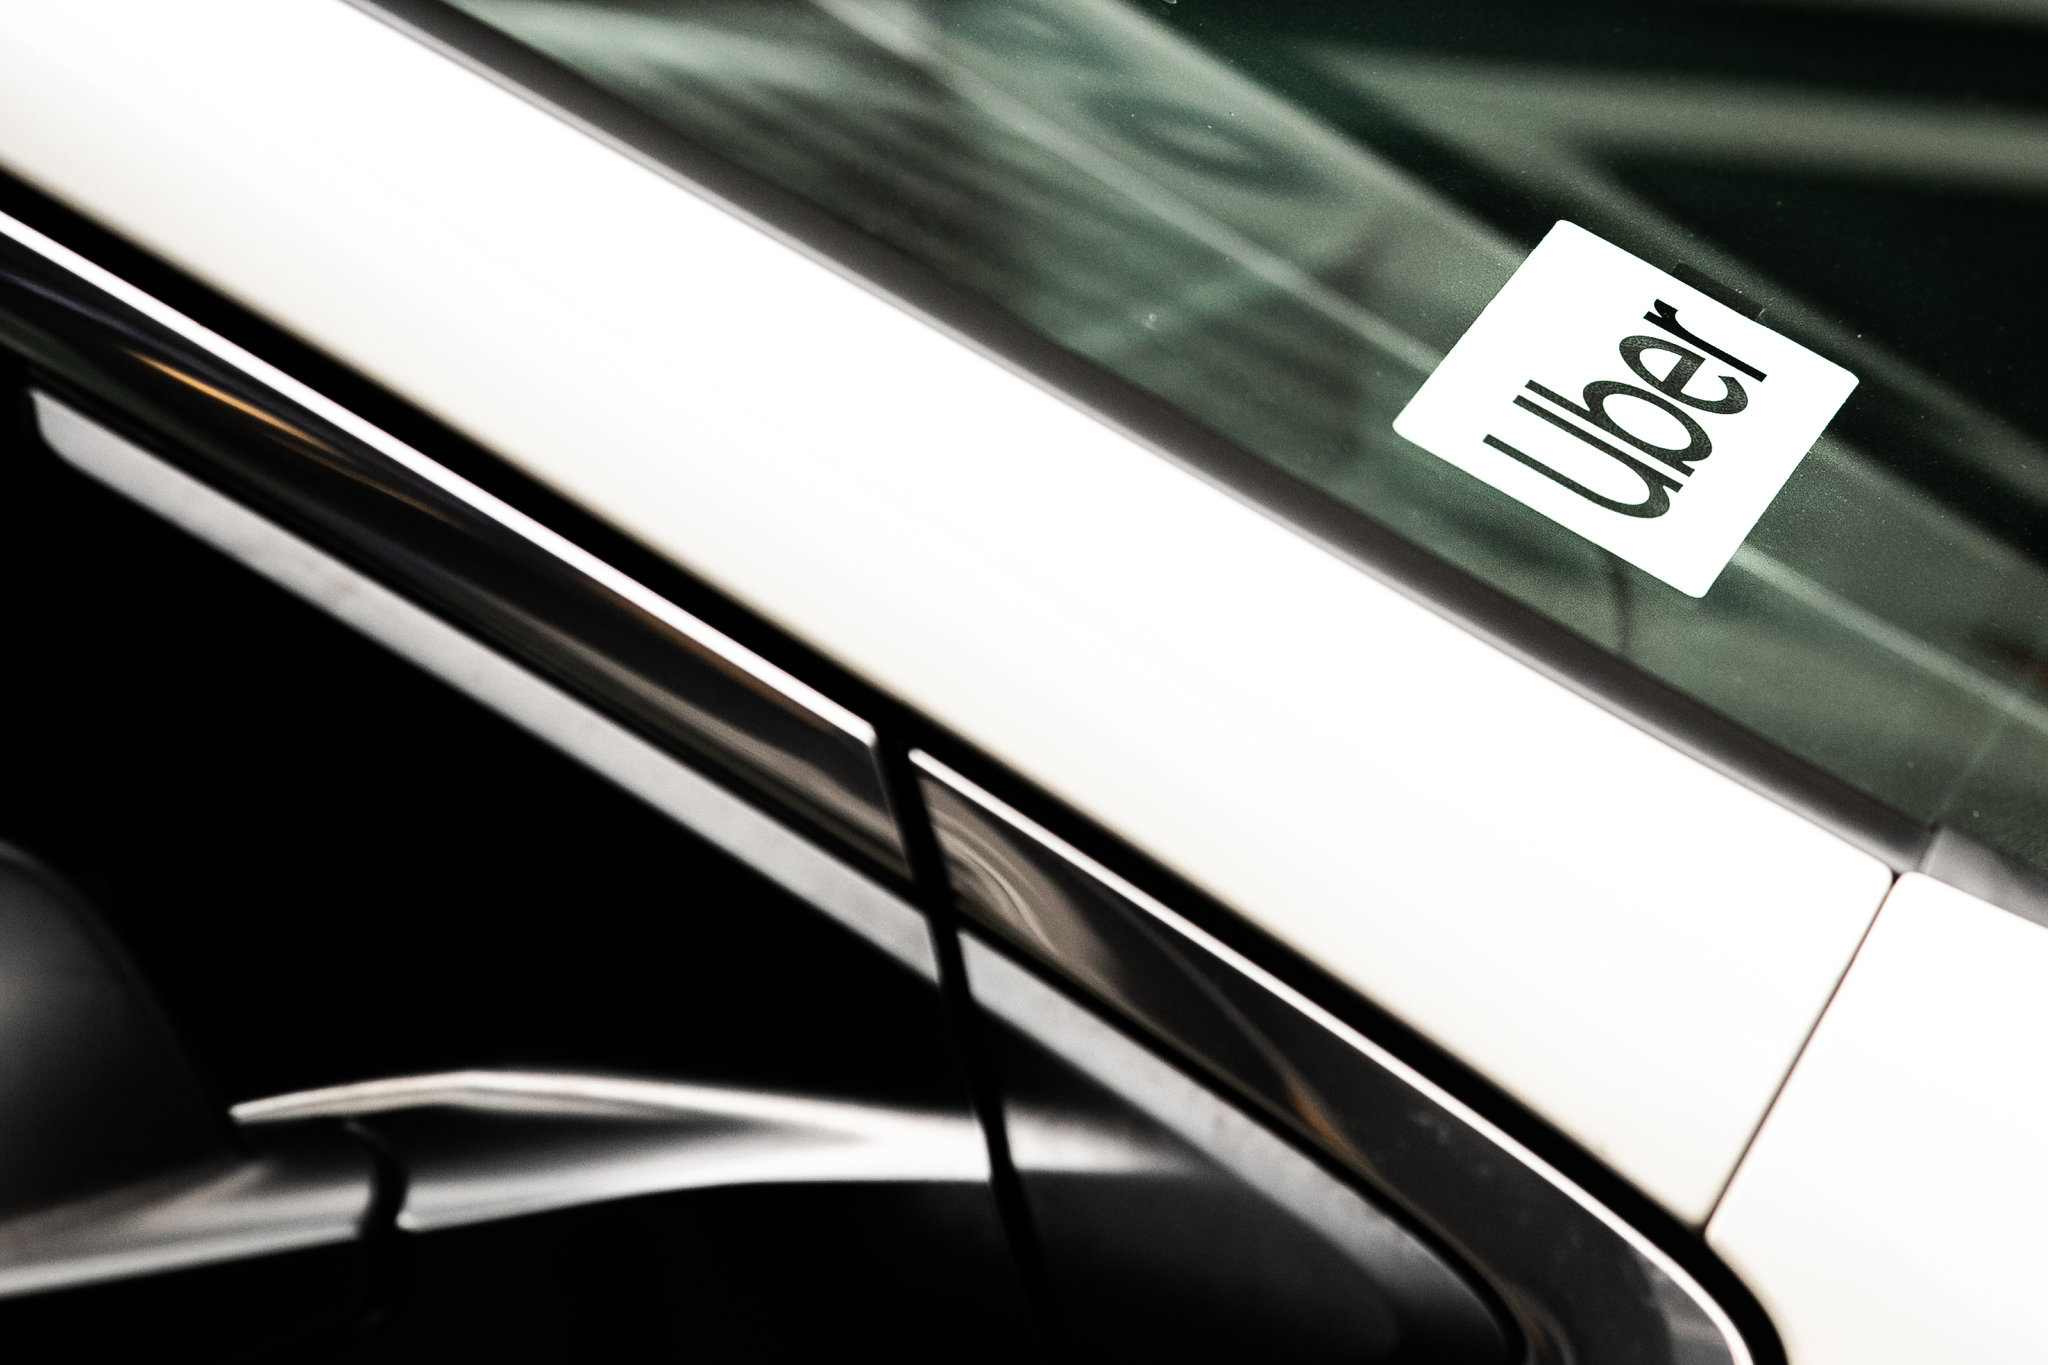 Uber Prices I.P.O. at $45 a Share, Valuing It at $82.4 Billion Thumbnail